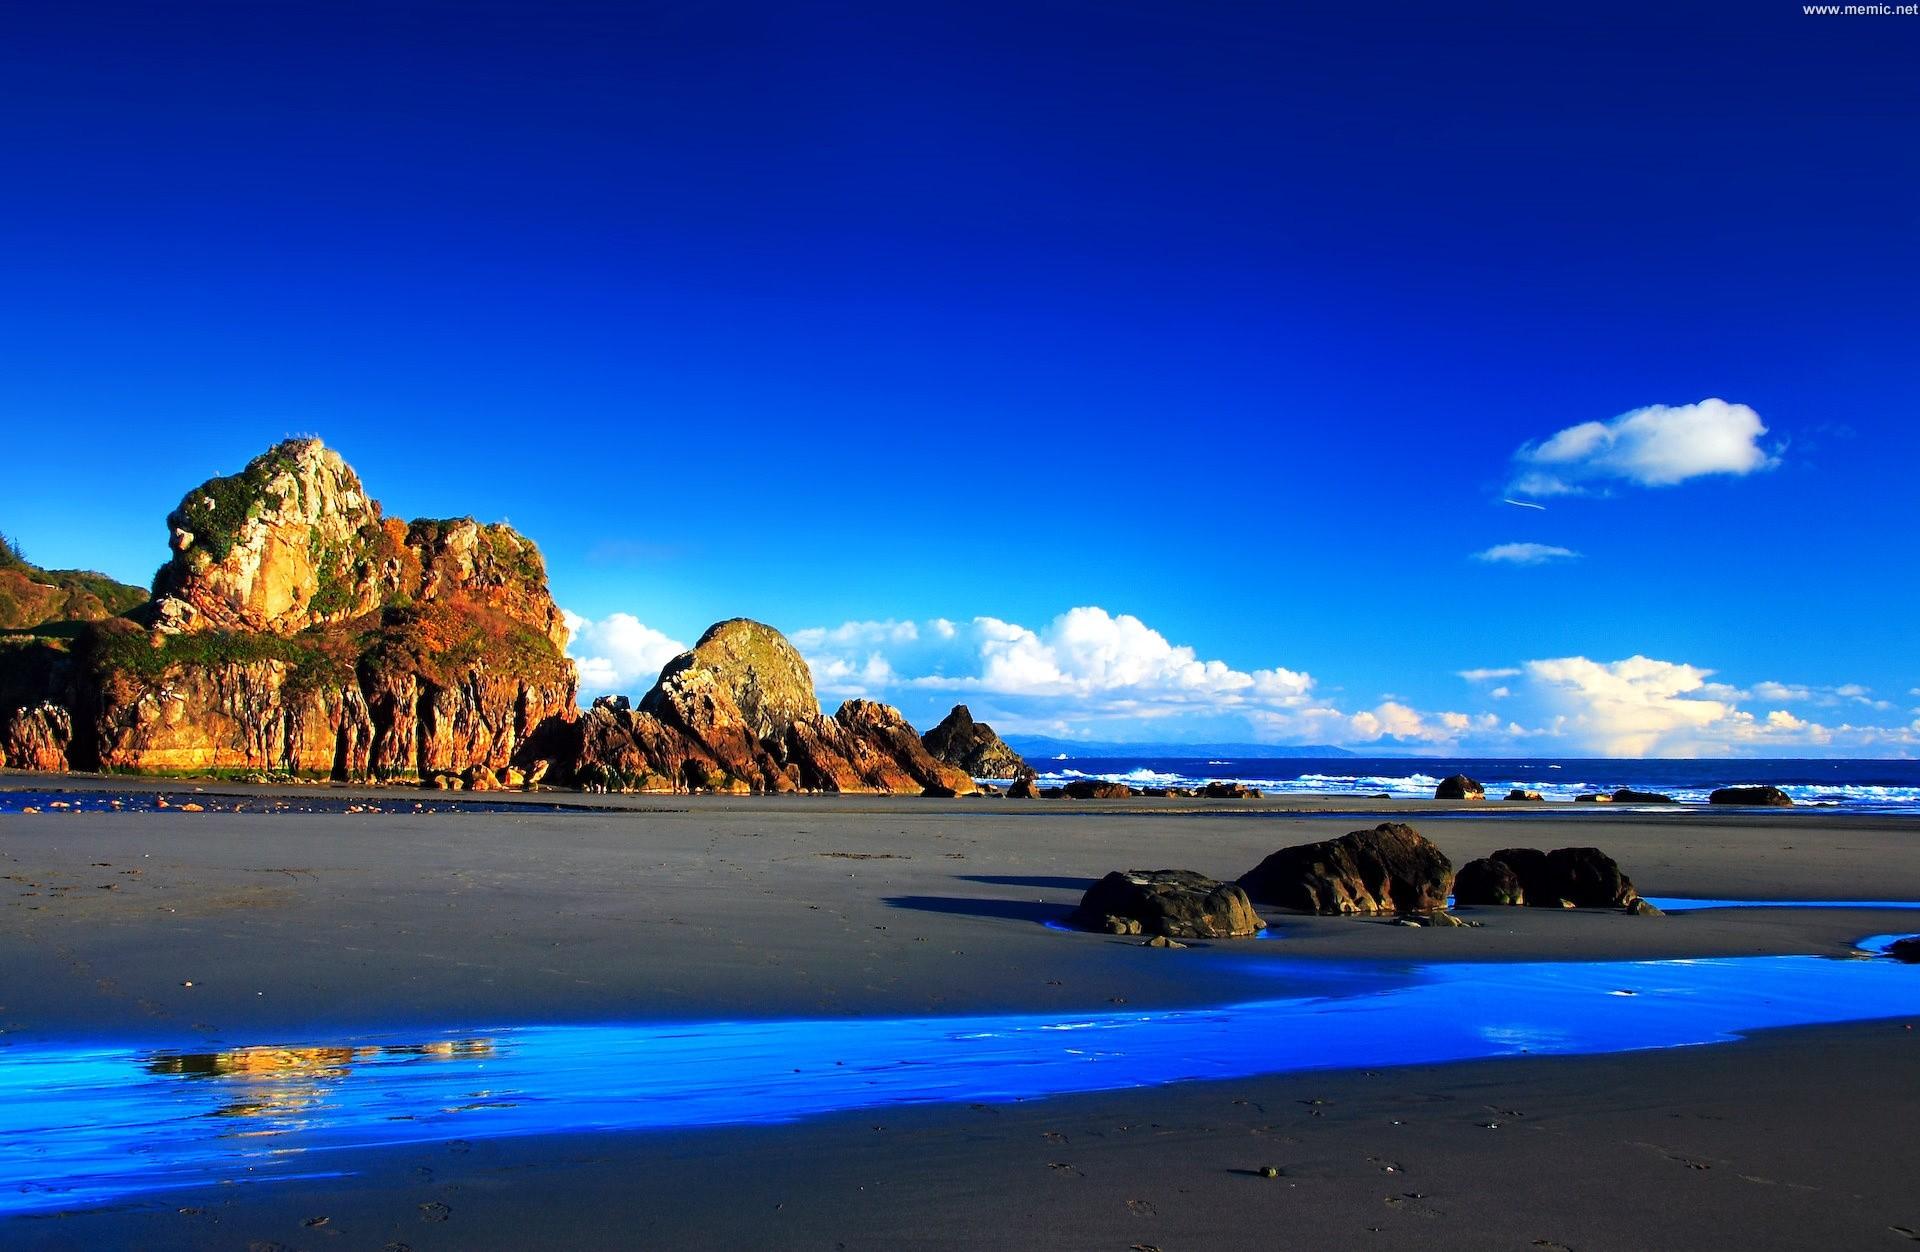 Sfondi hd paesaggi 74 immagini for Paesaggi bellissimi per desktop